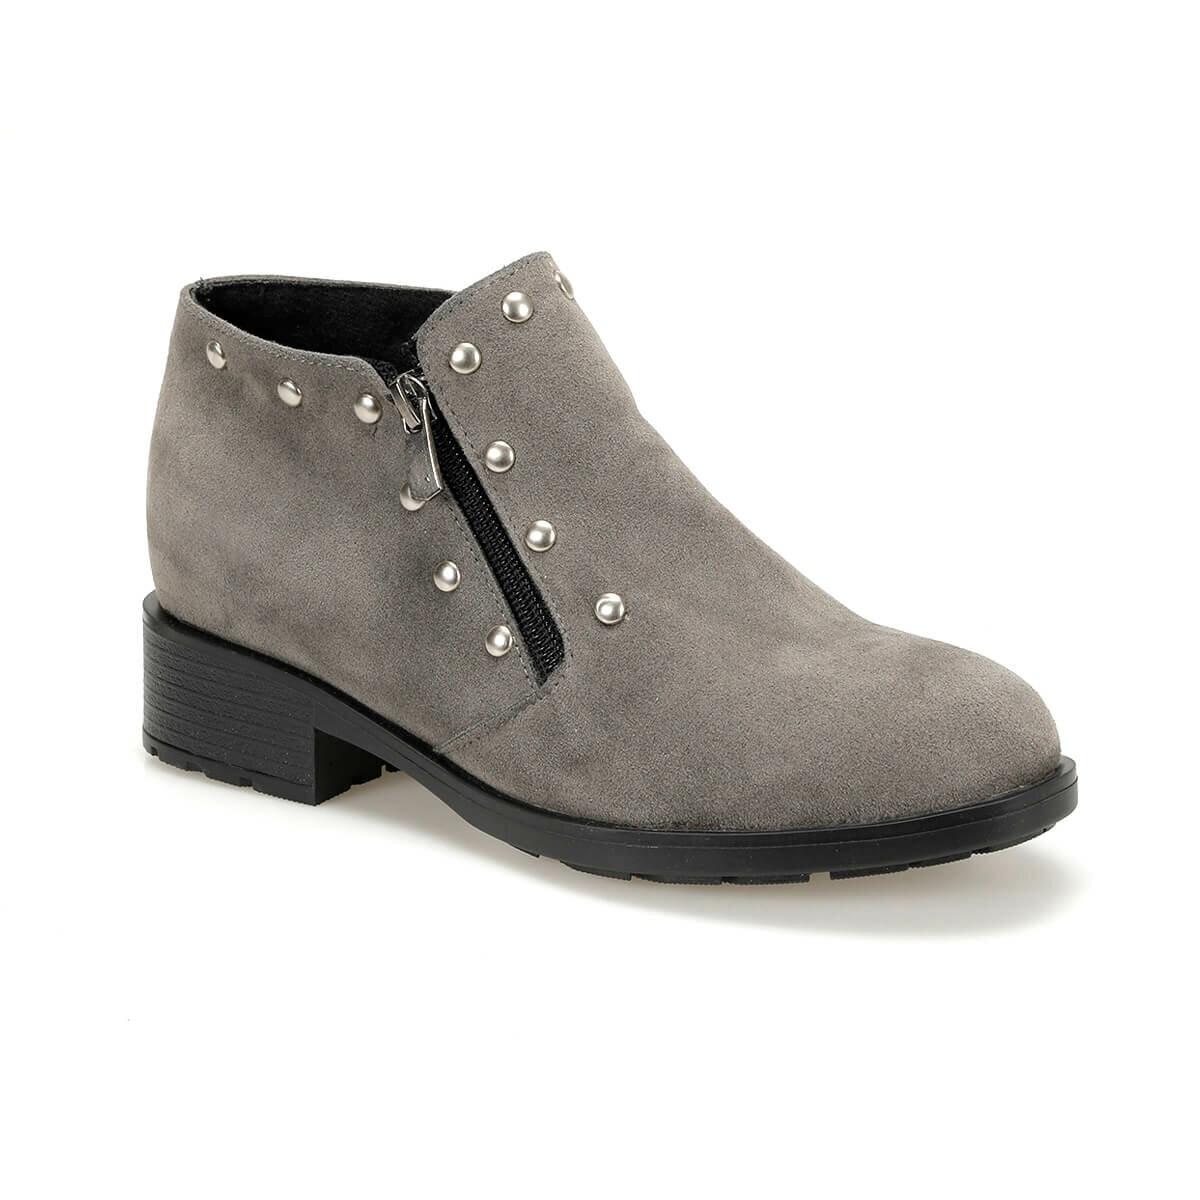 FLO PISIR77Z SKIN Gray Women 'S Boots BUTIGO